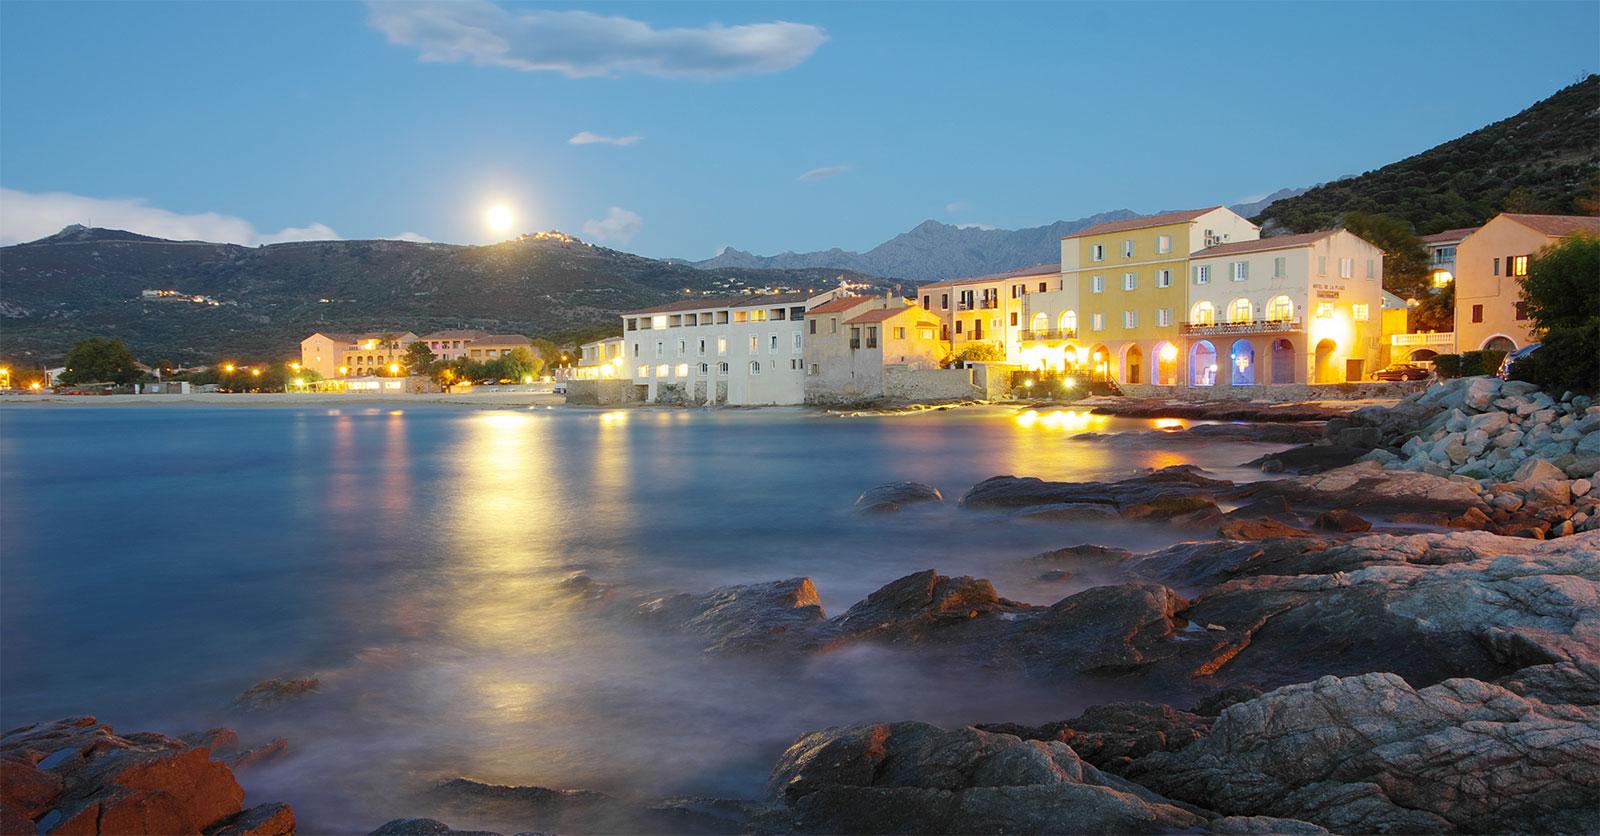 Ihr Urlaub in Korsika in Algajola | Arinella - Arinella Residence ...